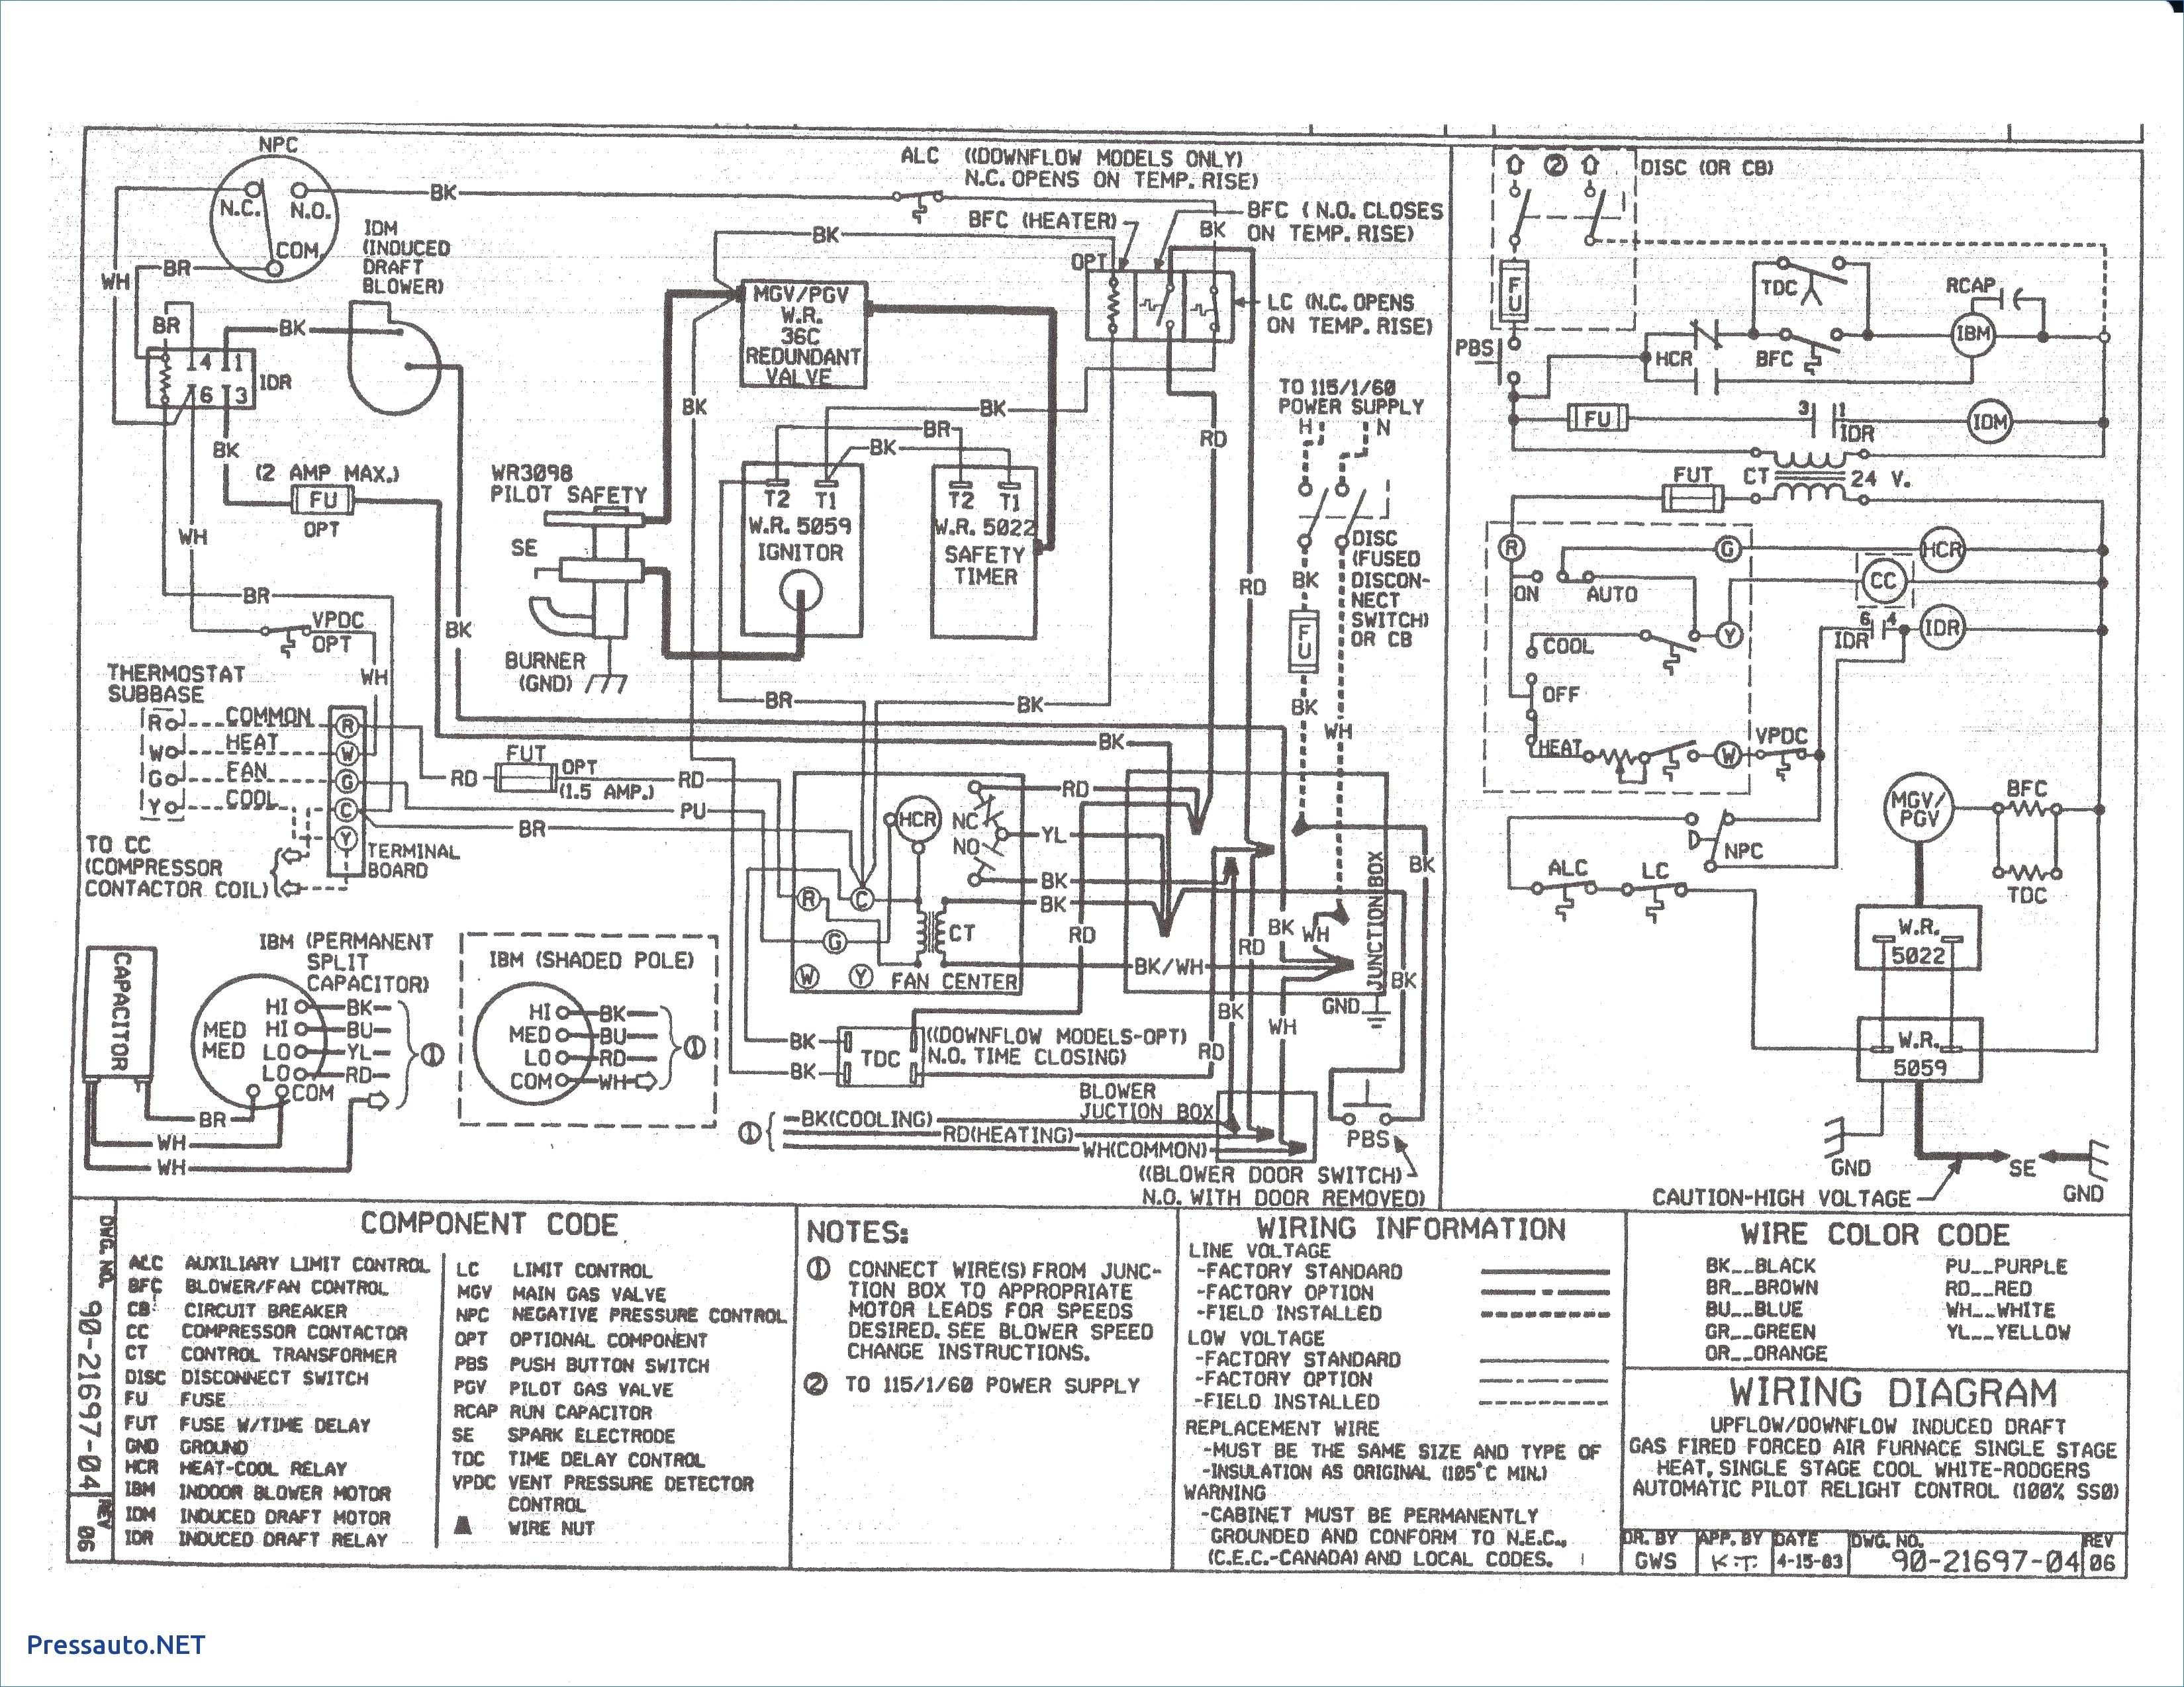 Mobile Home Wiring Diagram Oakwood Mobile Home Wiring Diagram Tent Trailer Diagrams Intertherm Of Mobile Home Wiring Diagram